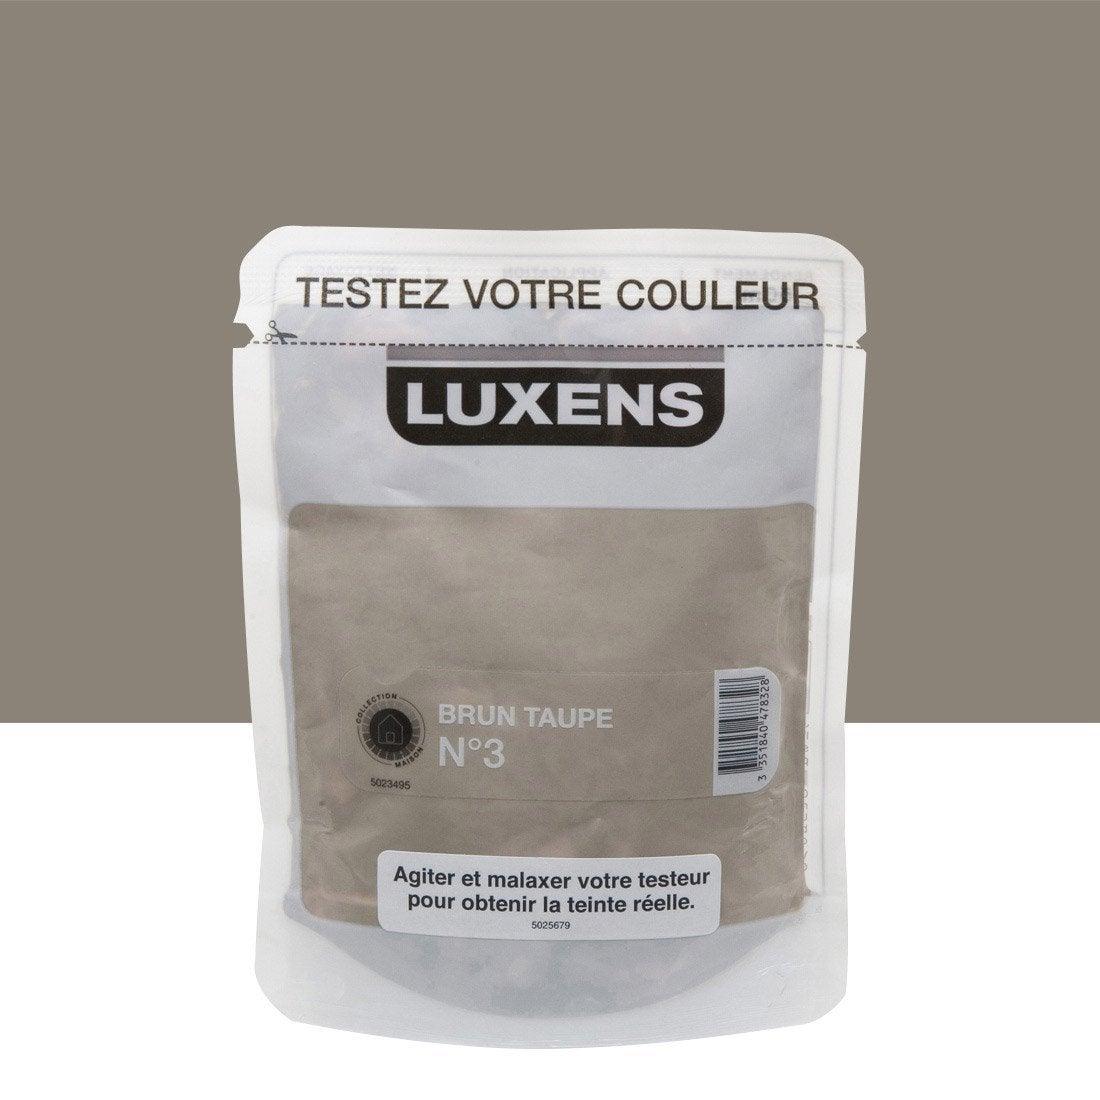 Nuancier peinture leroy merlin luxens id e - Peinture lambris leroy merlin ...